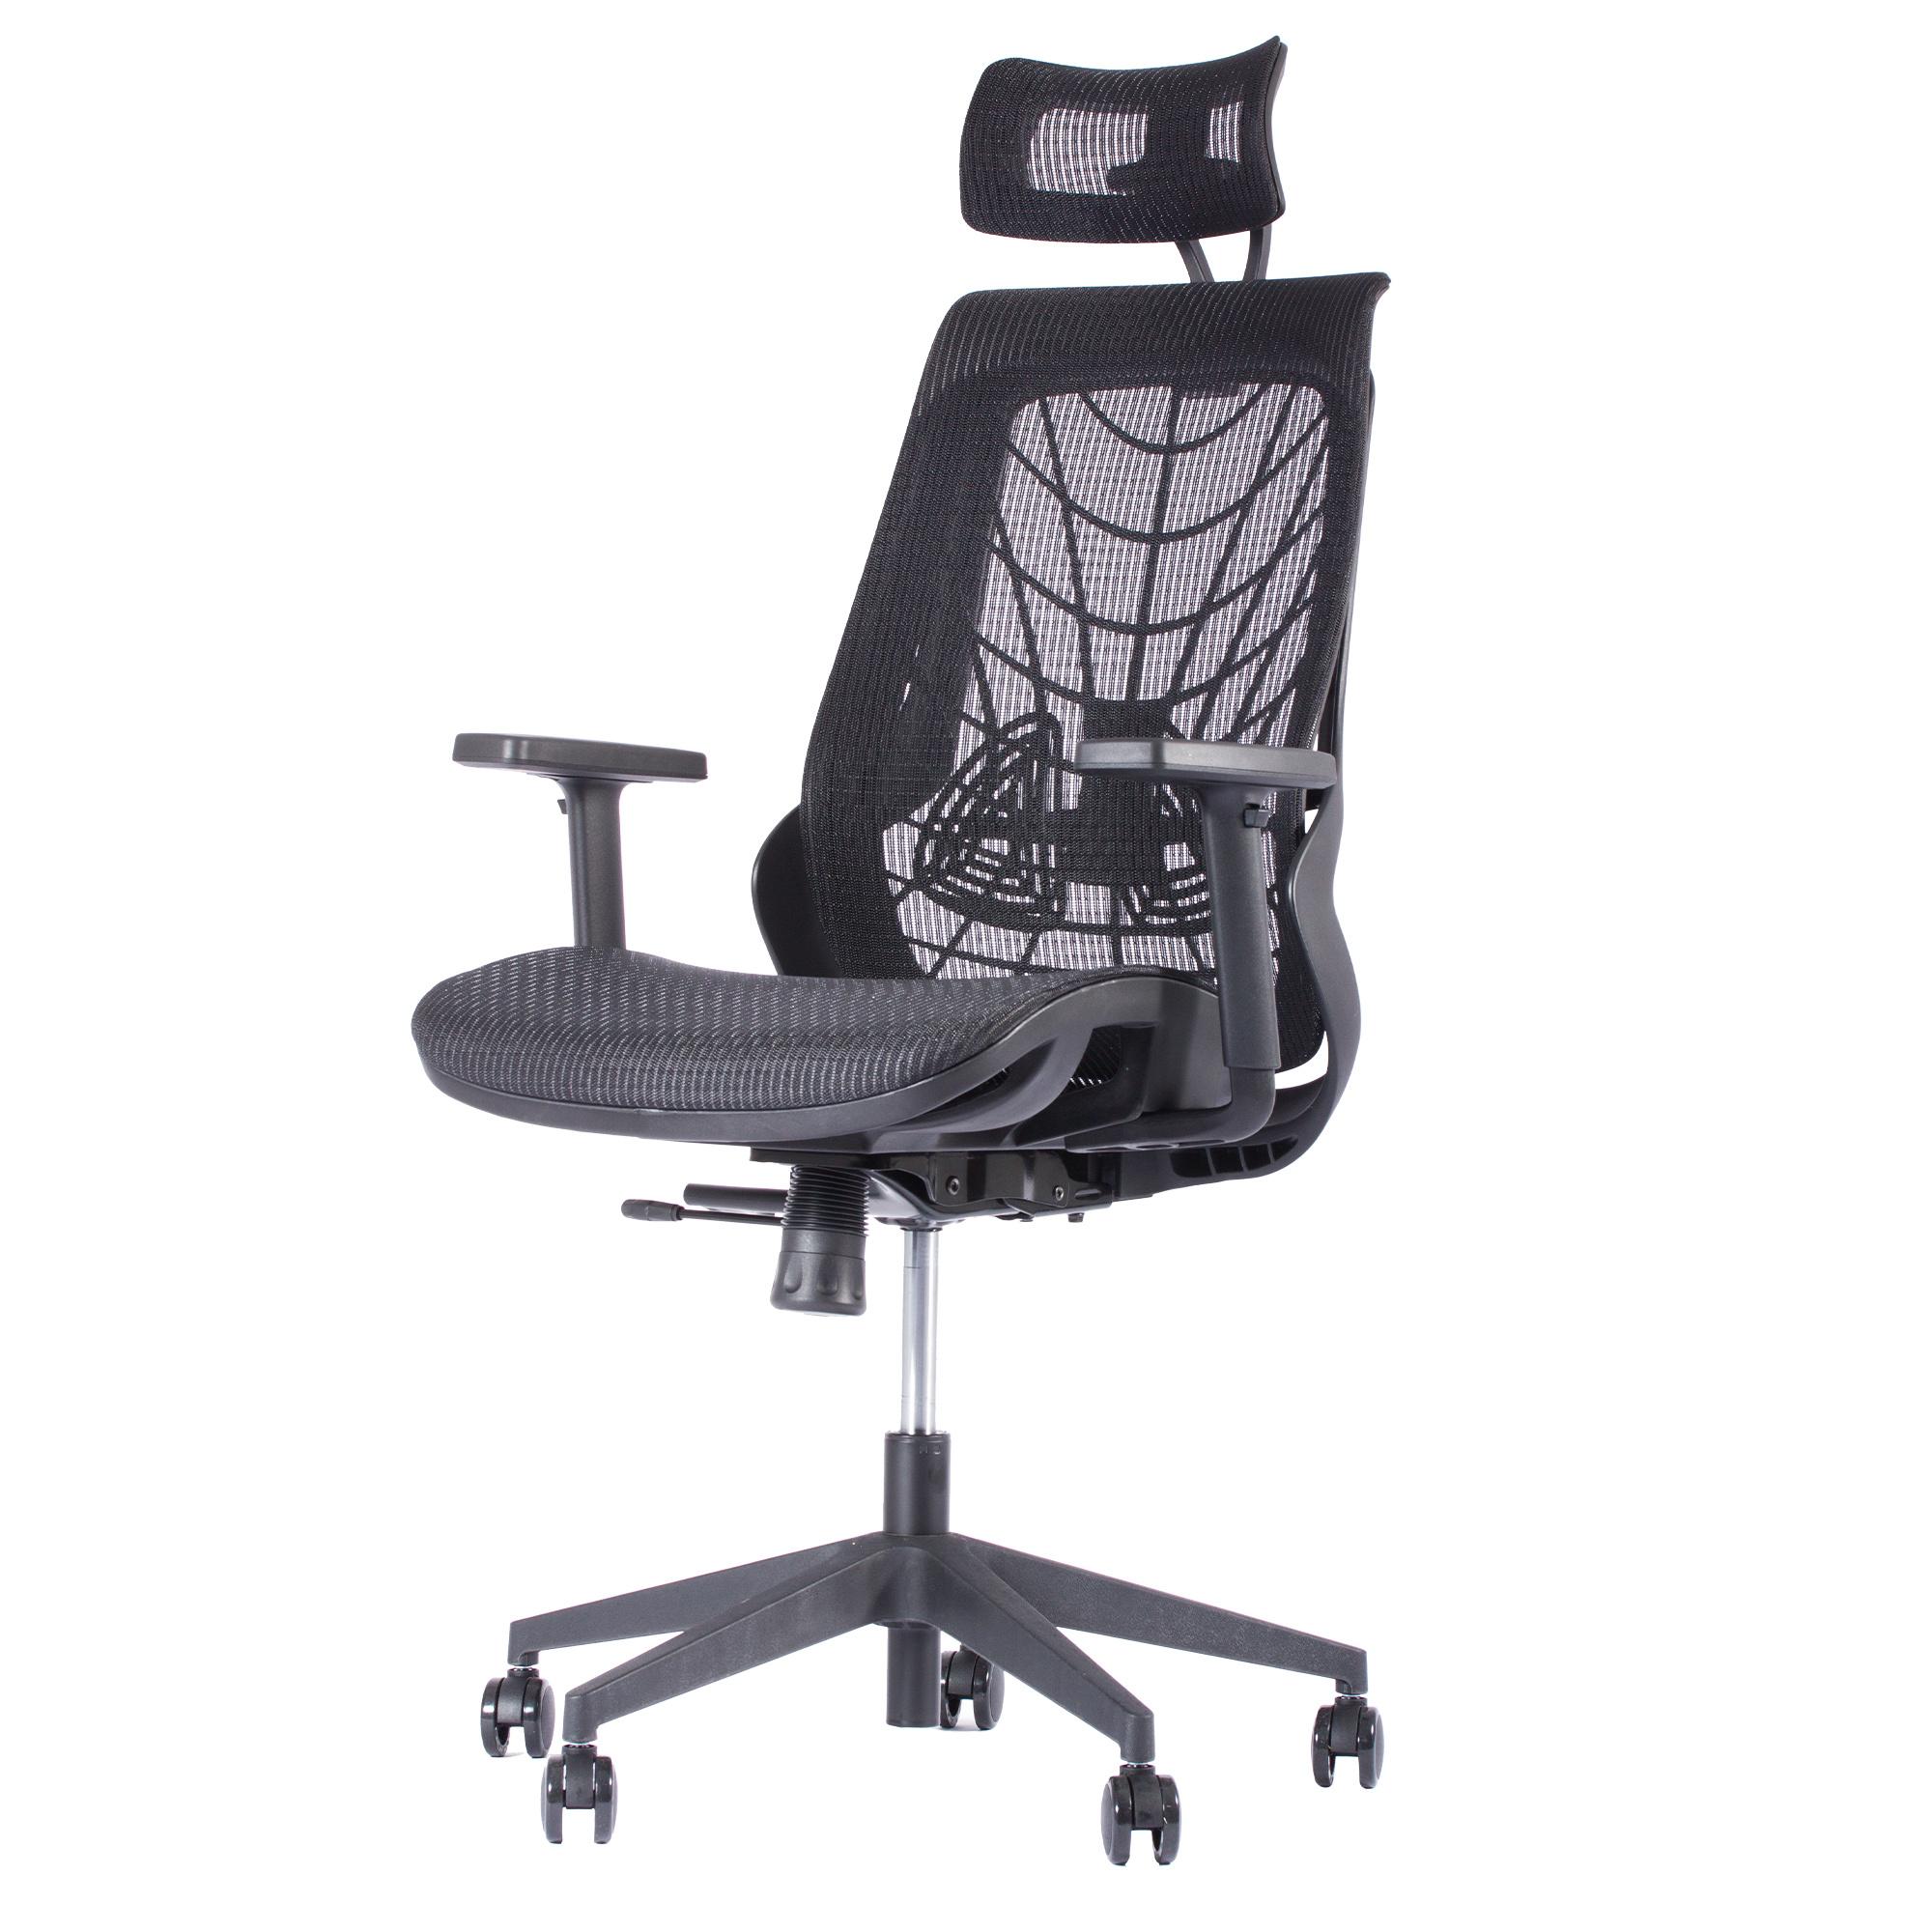 Bureaustoel Zwart Design.Ergonomische Bureaustoel Ergo 2 Zwart Deals2day